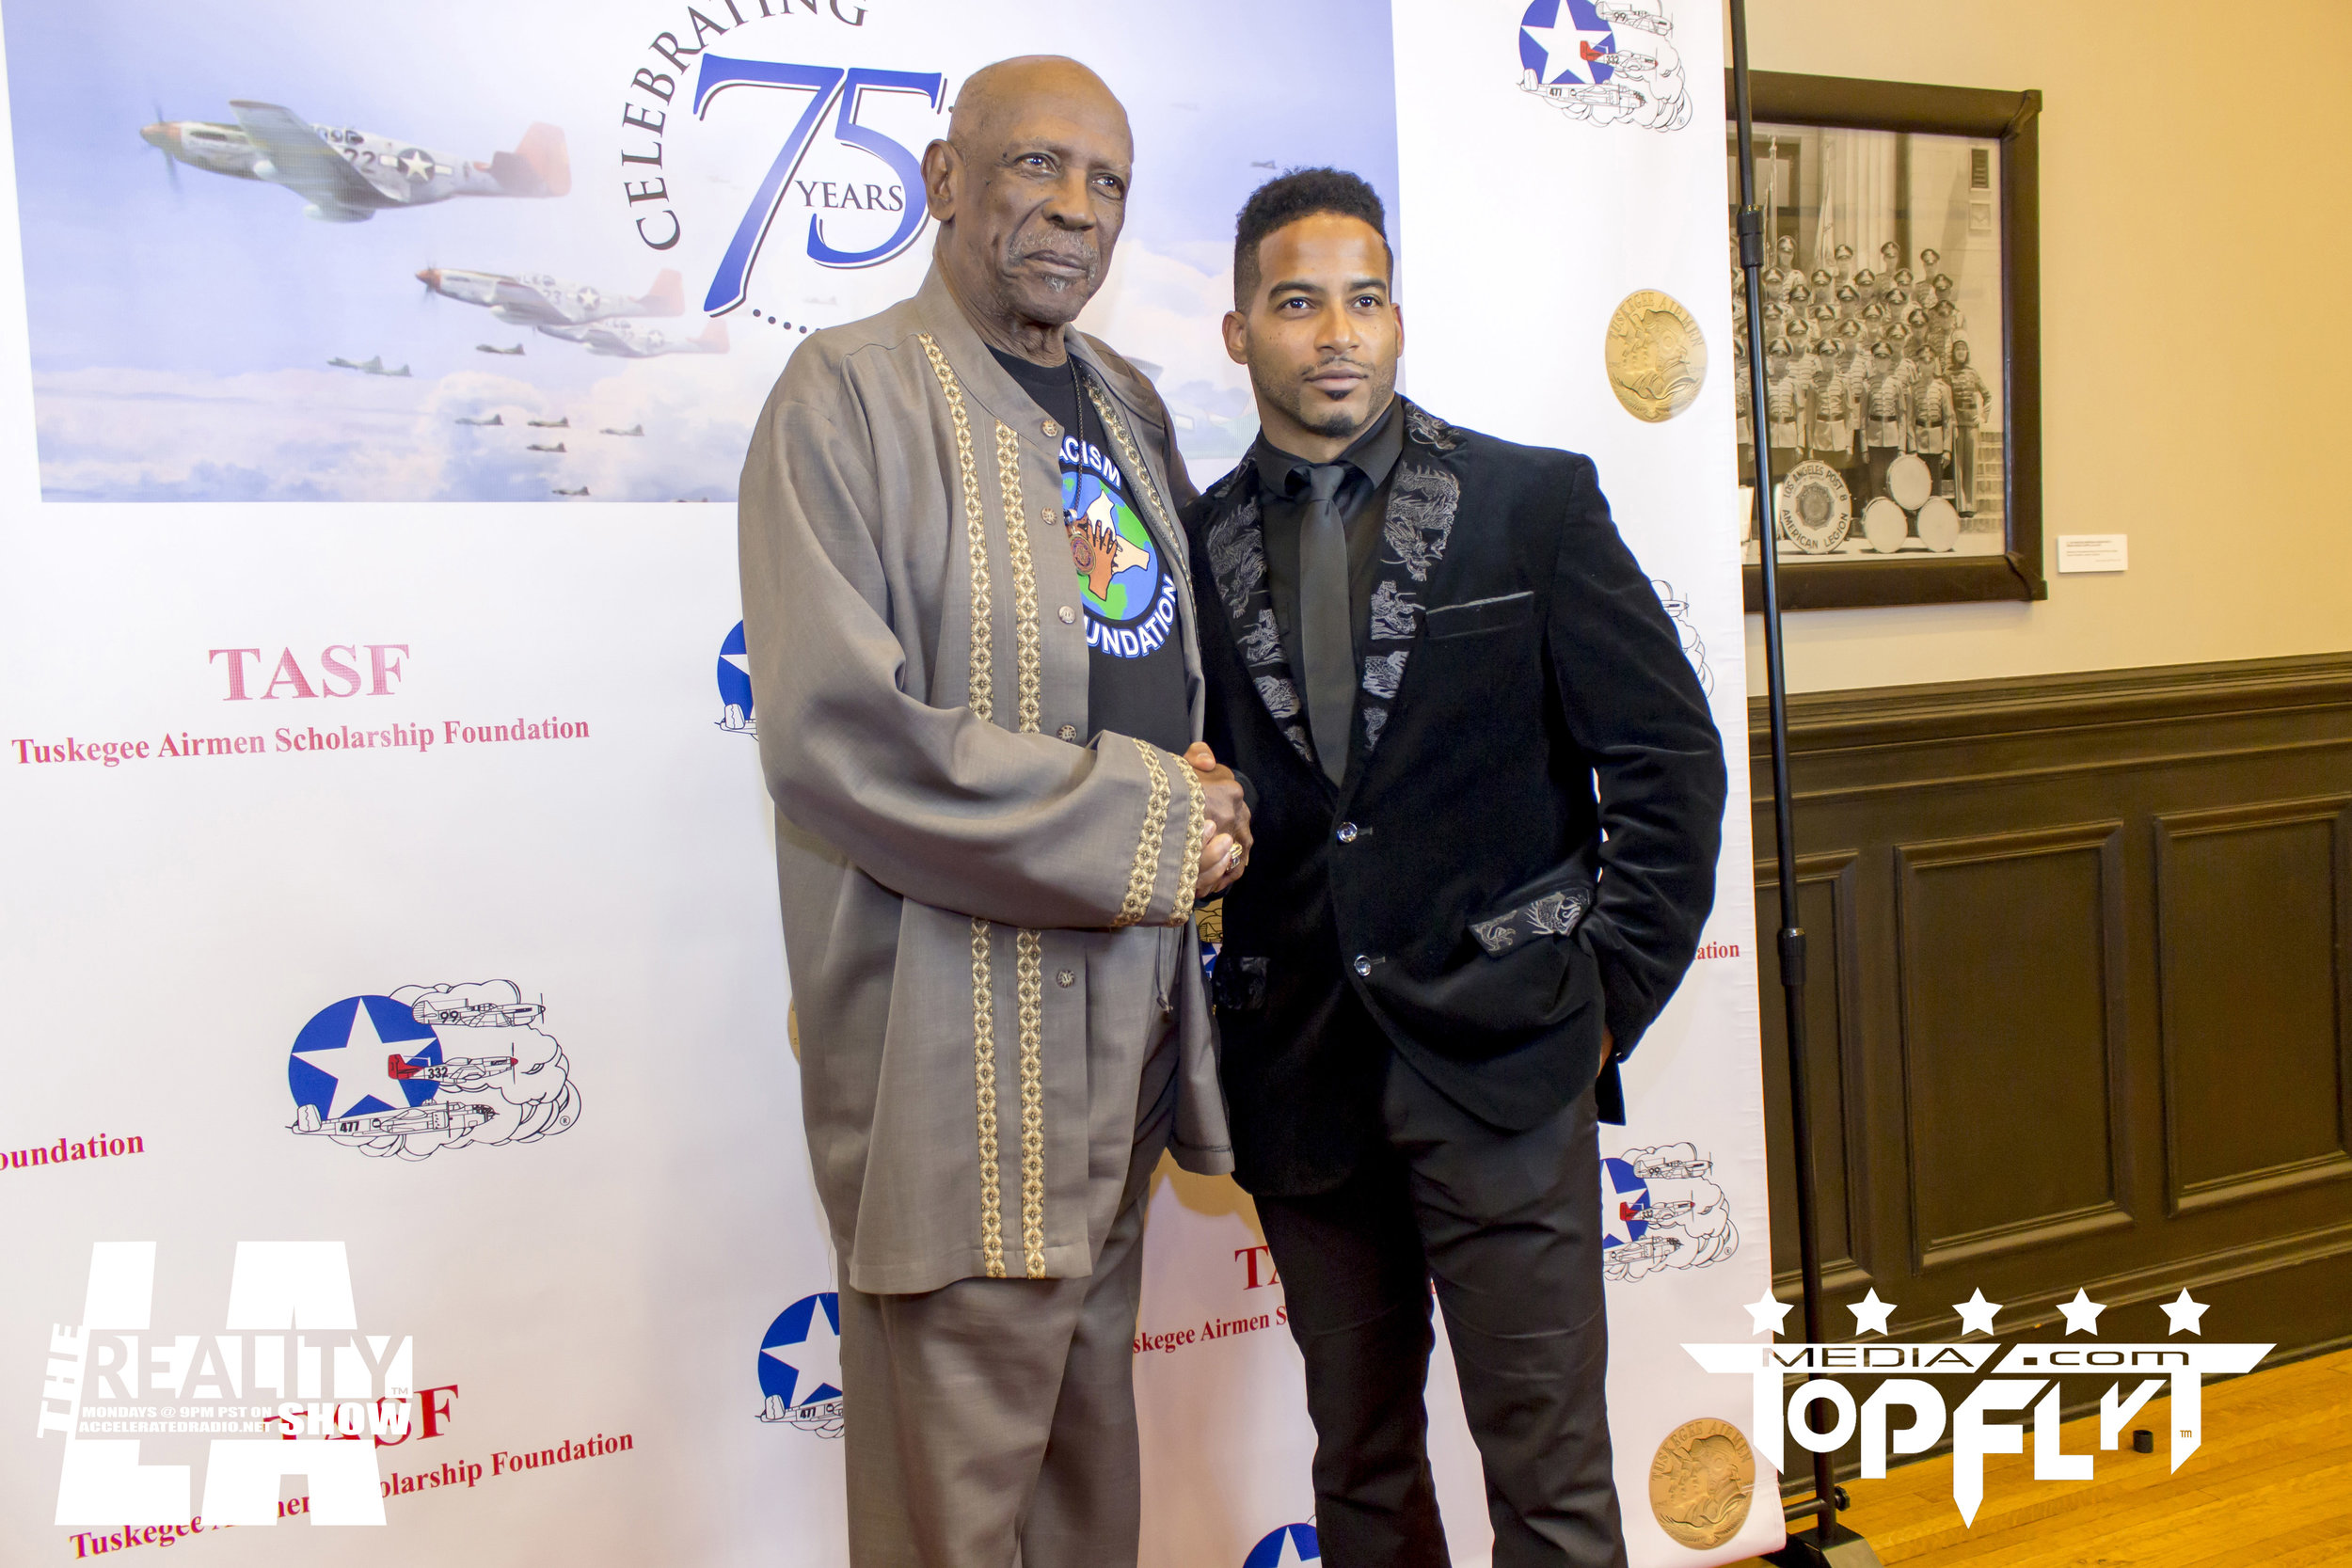 The Reality Show LA - Tuskegee Airmen 75th Anniversary VIP Reception_154.jpg